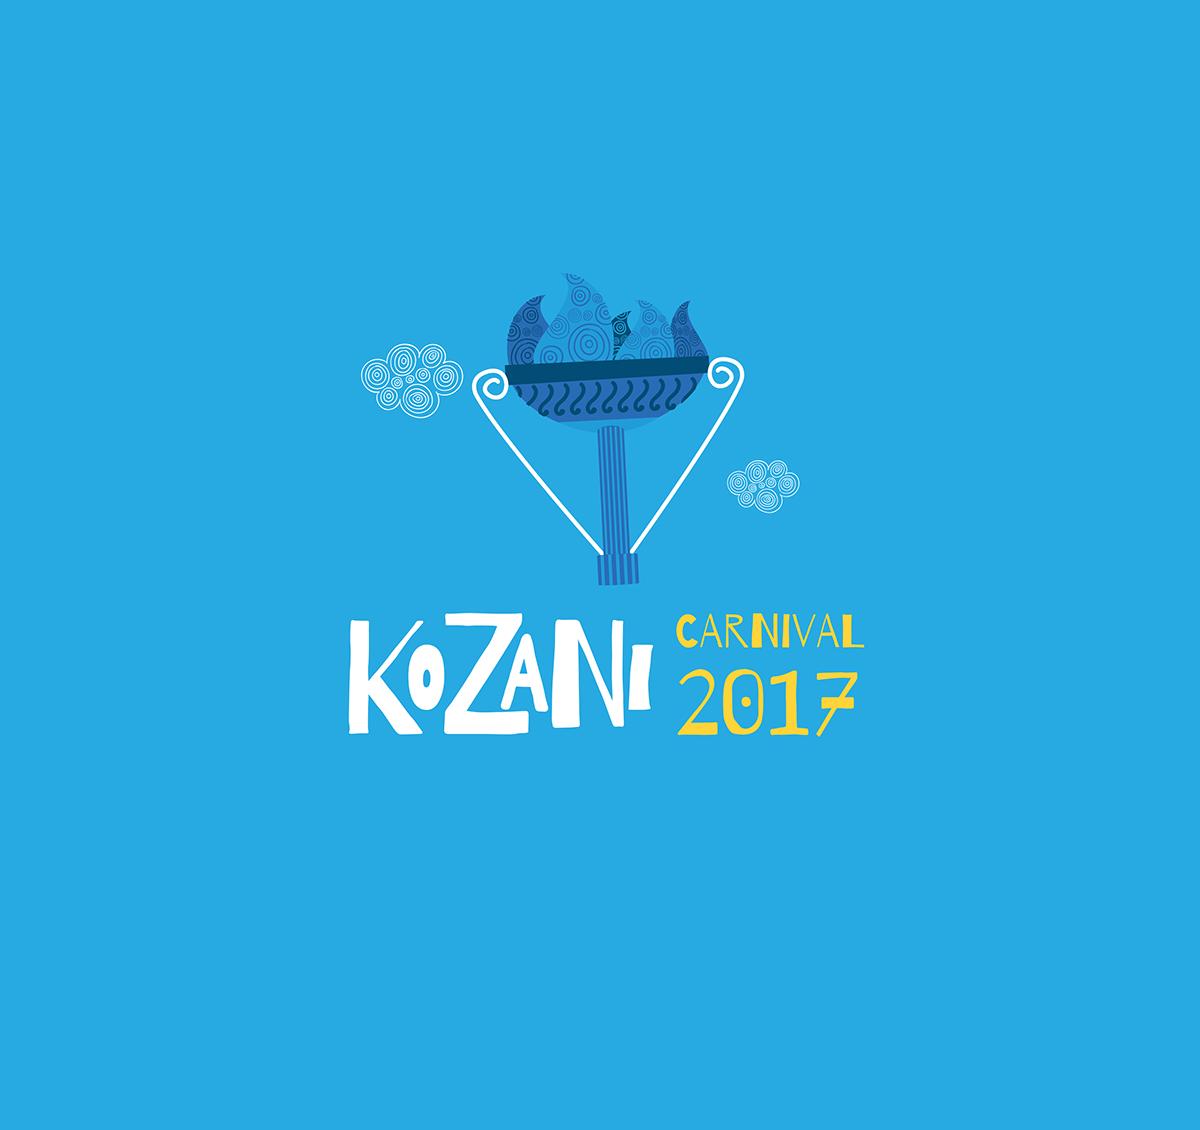 Kozani Carnival 2017 on Behance